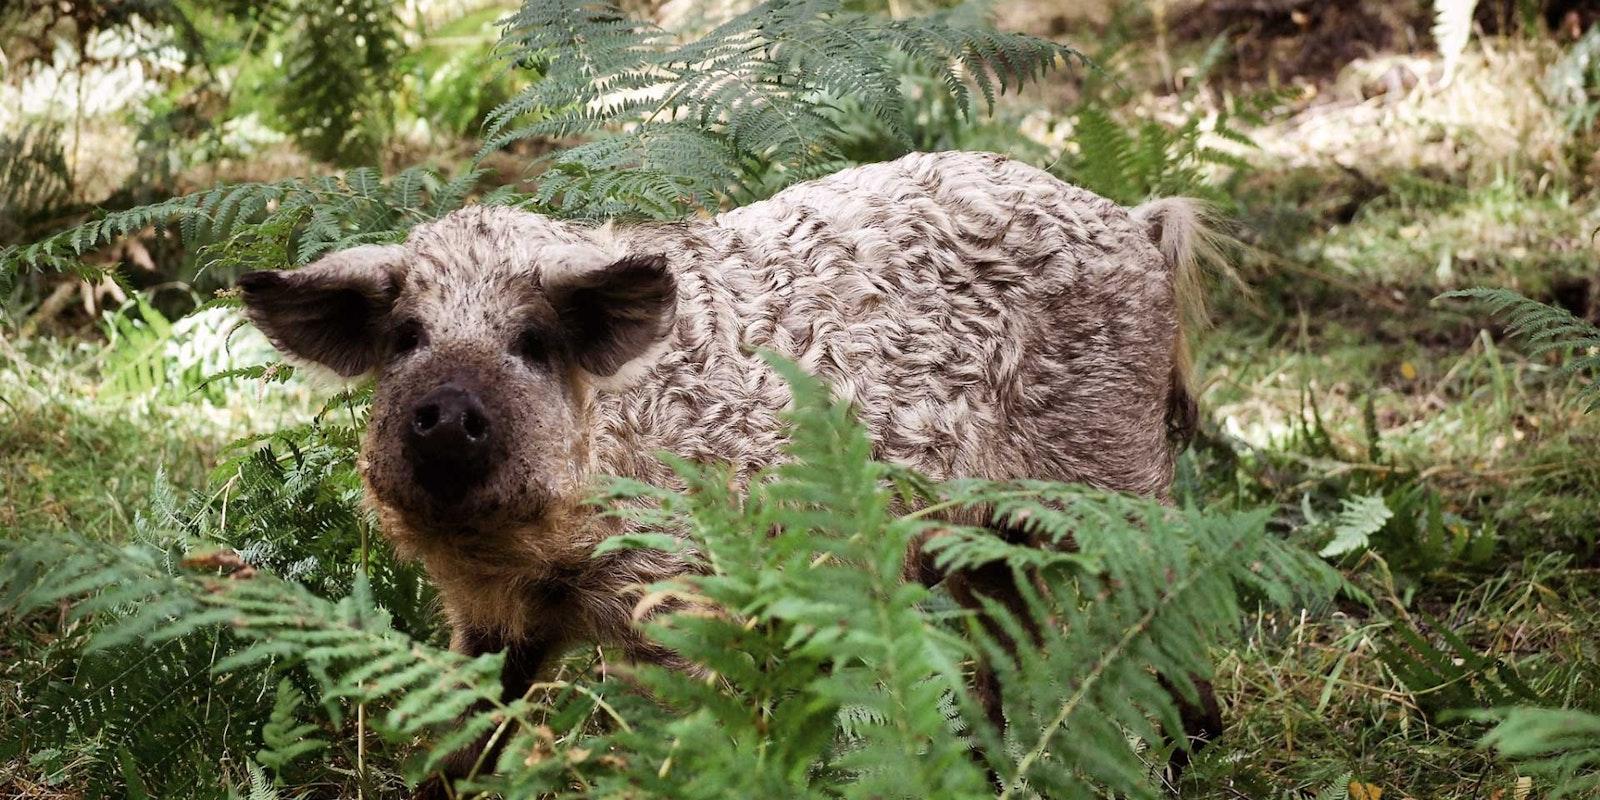 a wild pig in woodland